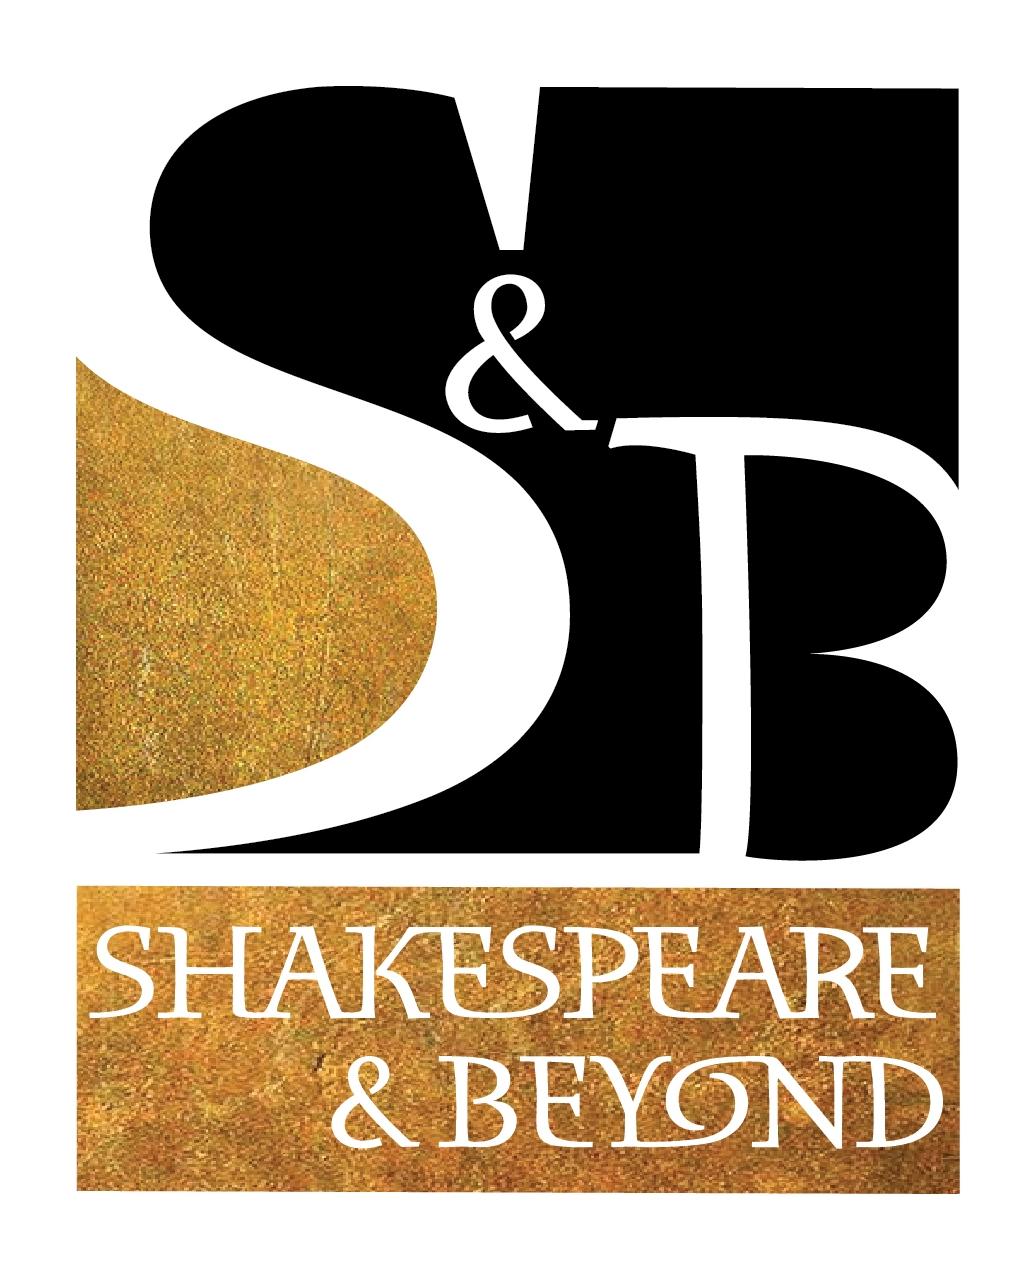 Shakespeare and Beyond_Version_6b_nov11-02-03-03.jpg